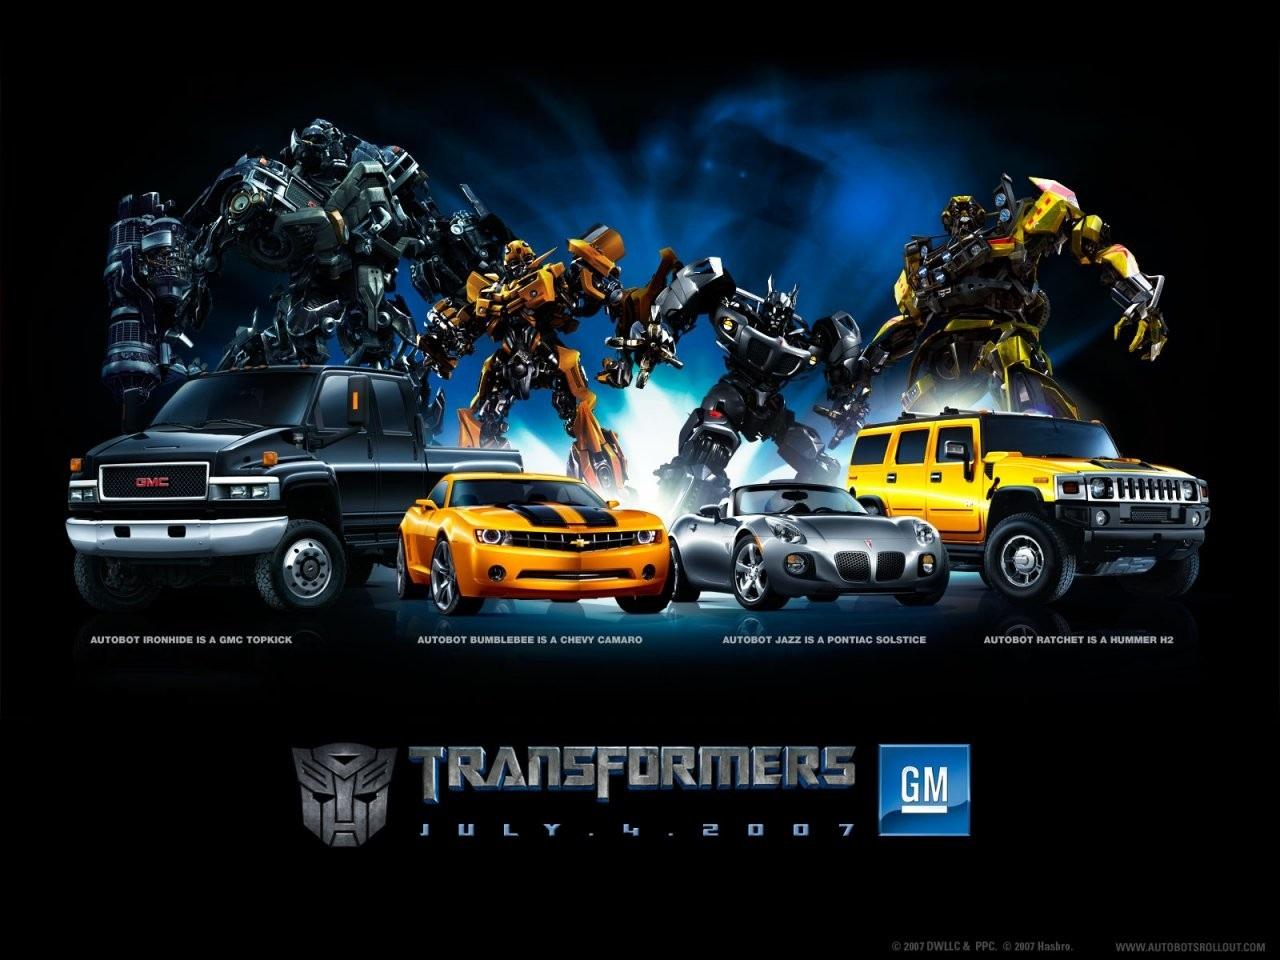 http://3.bp.blogspot.com/-gpBZuouJ3WM/ThgxJUOjXlI/AAAAAAAAAPE/uyVXsA13xsU/s1600/transformers-autobots-wallpaper.jpg